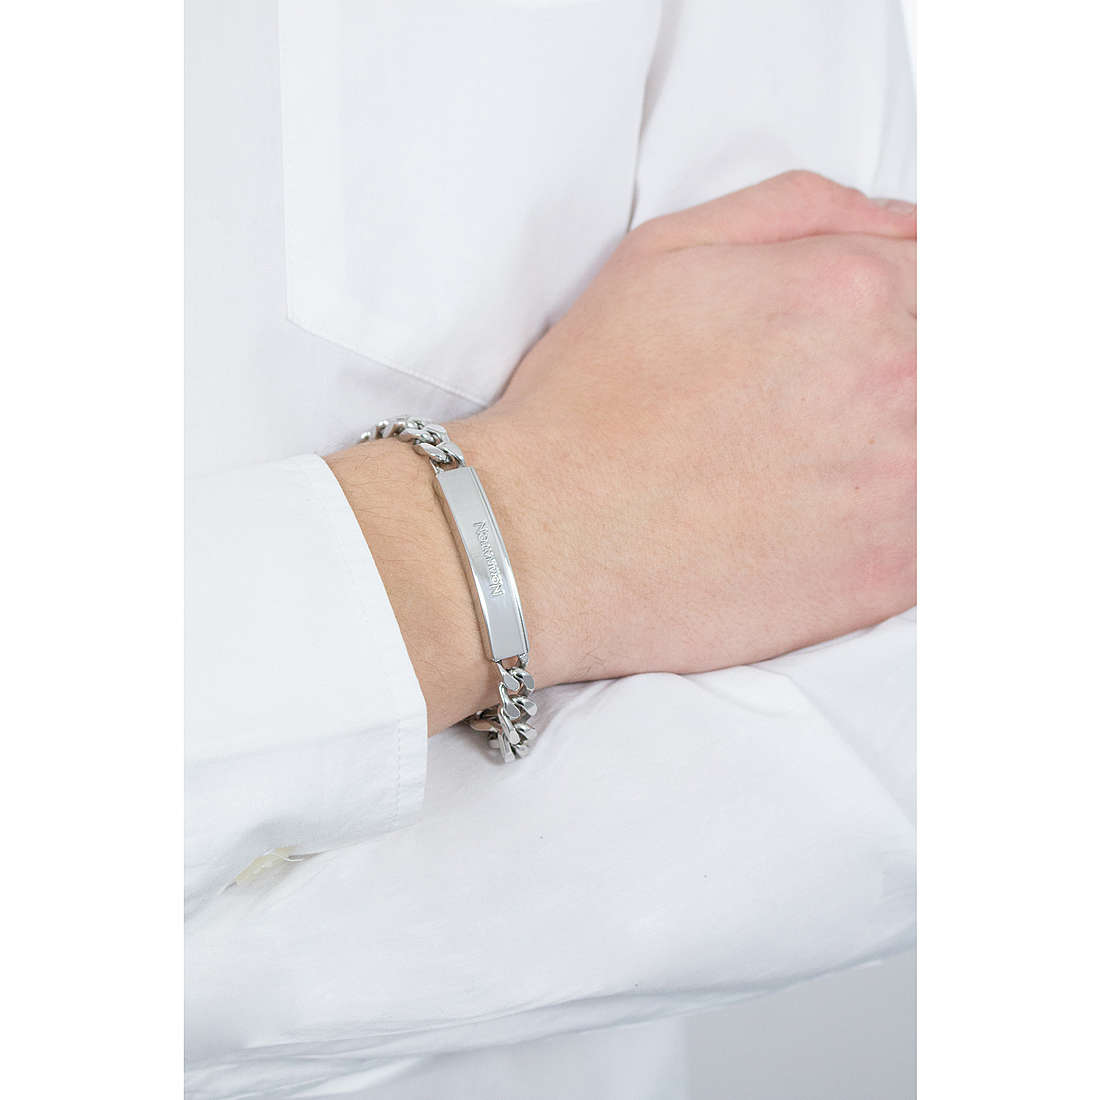 Nomination bracelets Bond man 021928/005 photo wearing